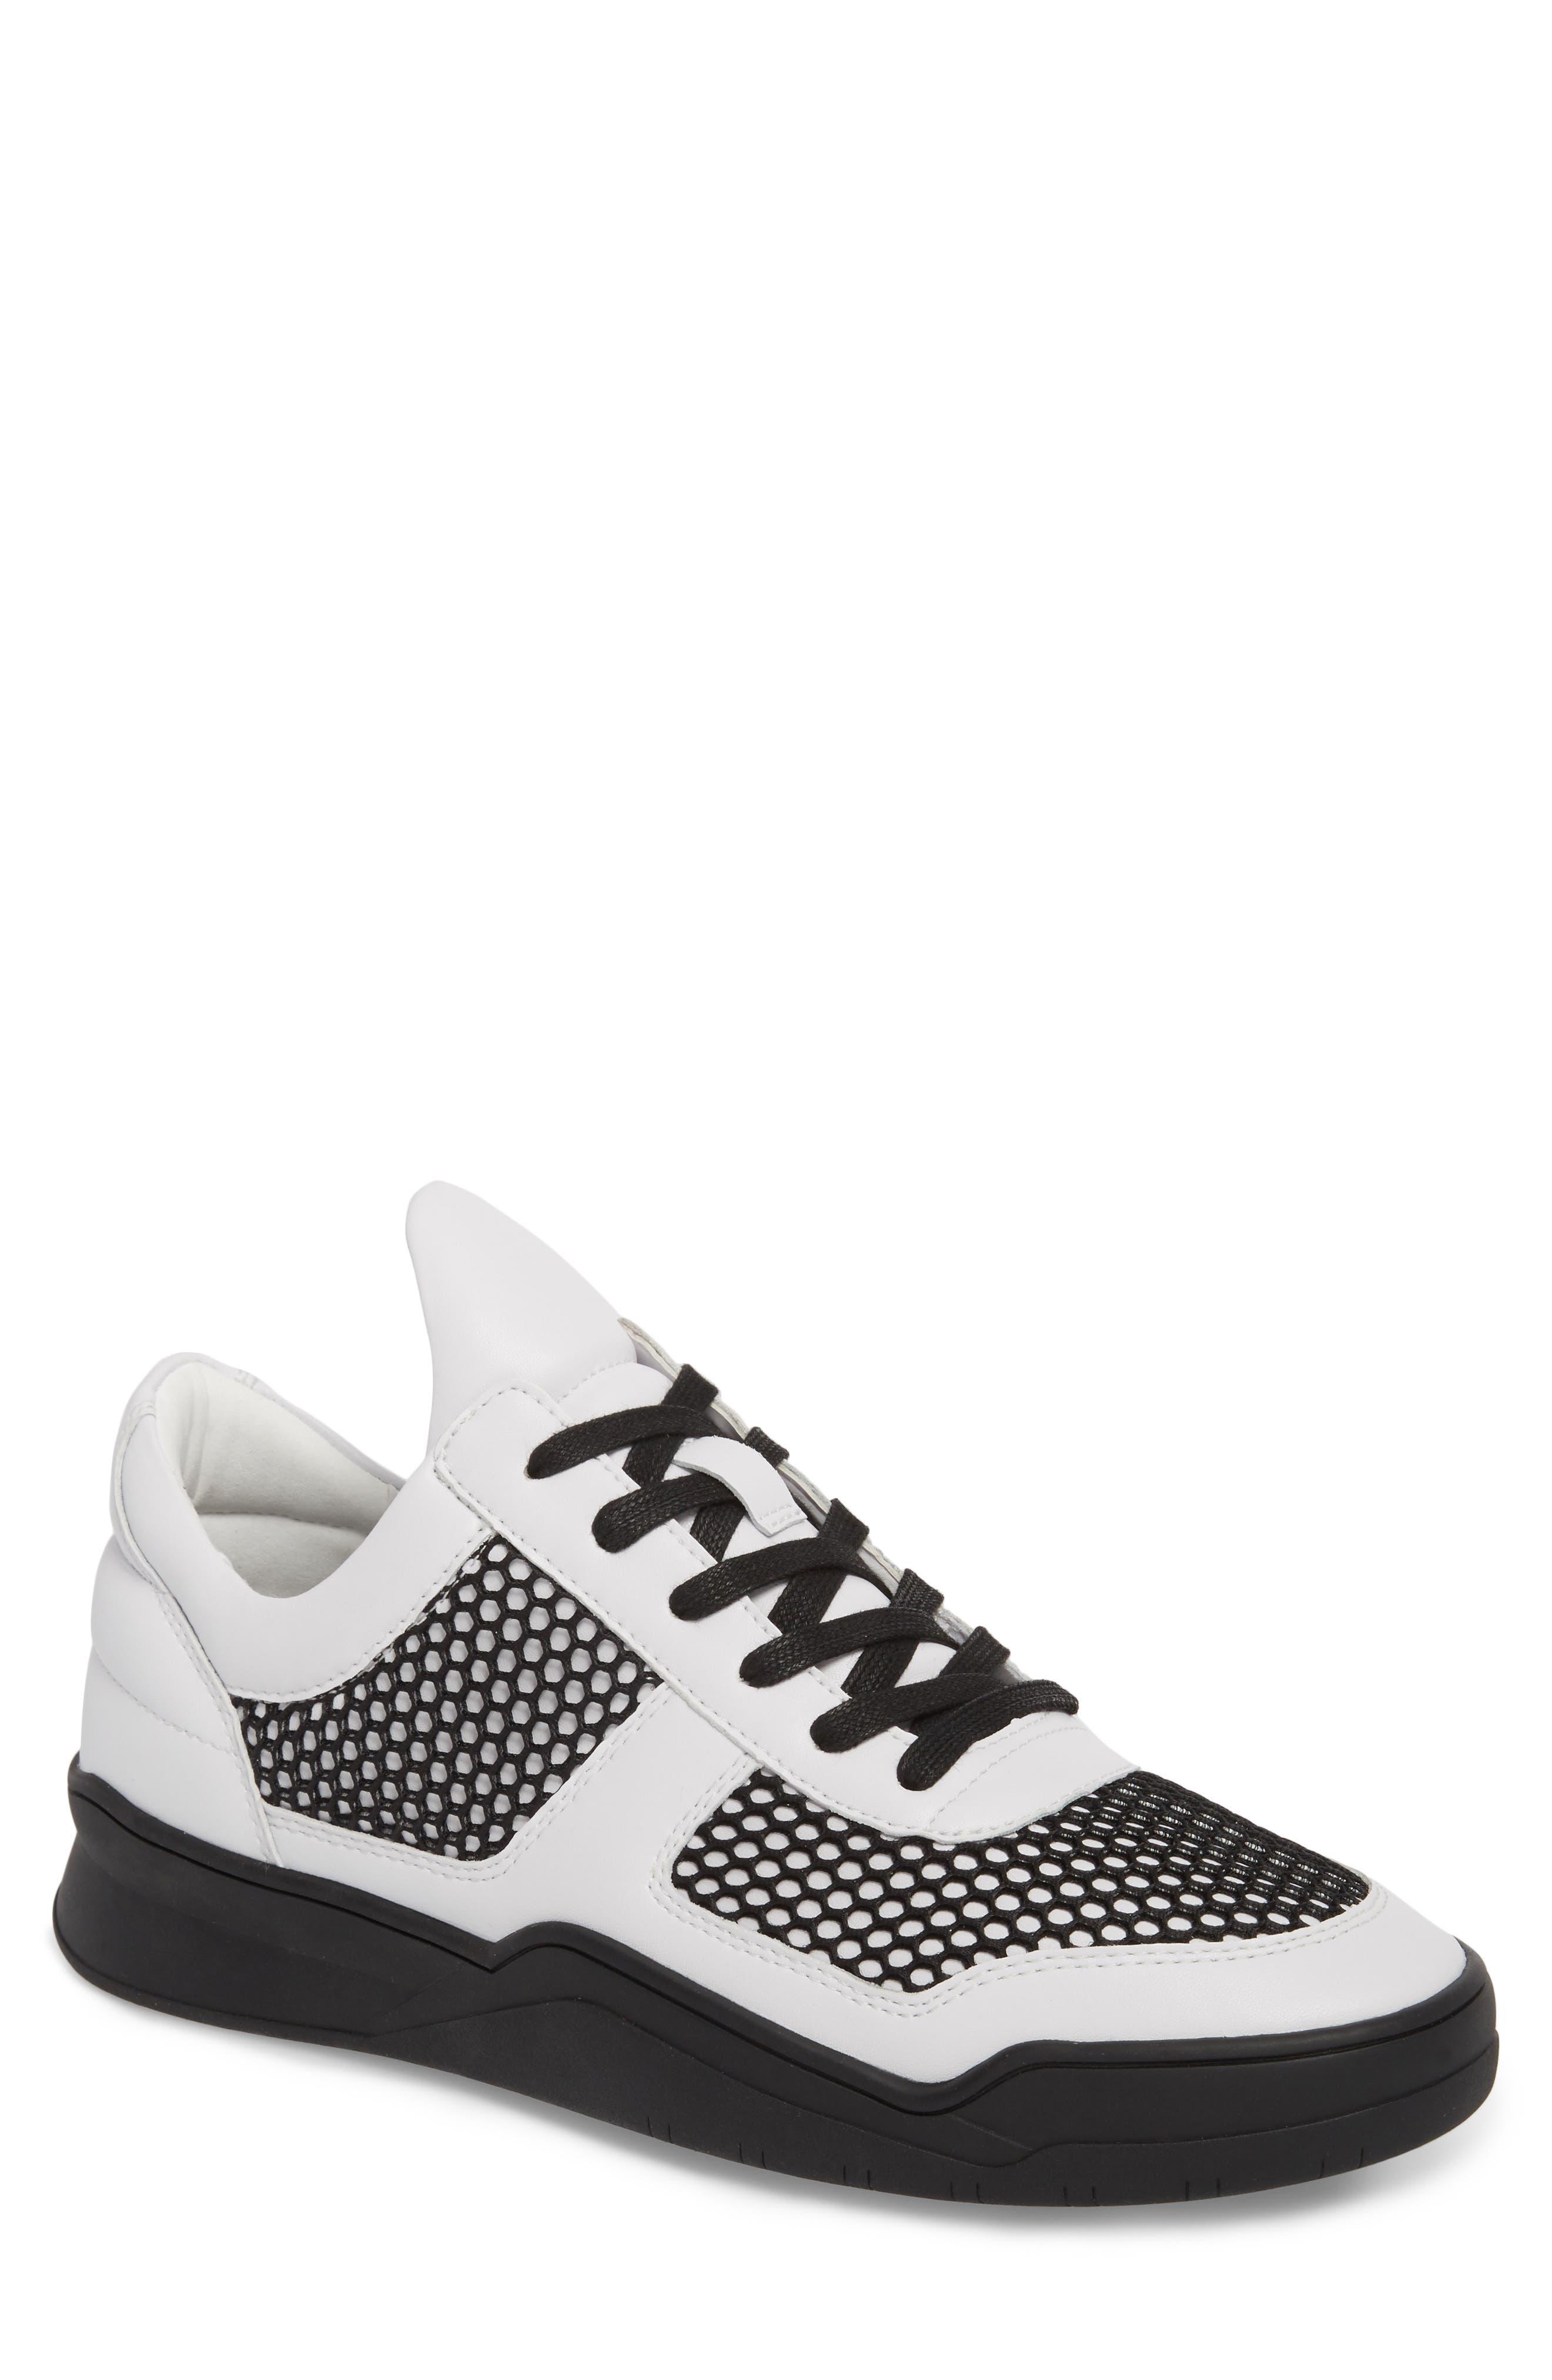 Karl Lagerfeld Paris Low-Top Sneaker (Men)